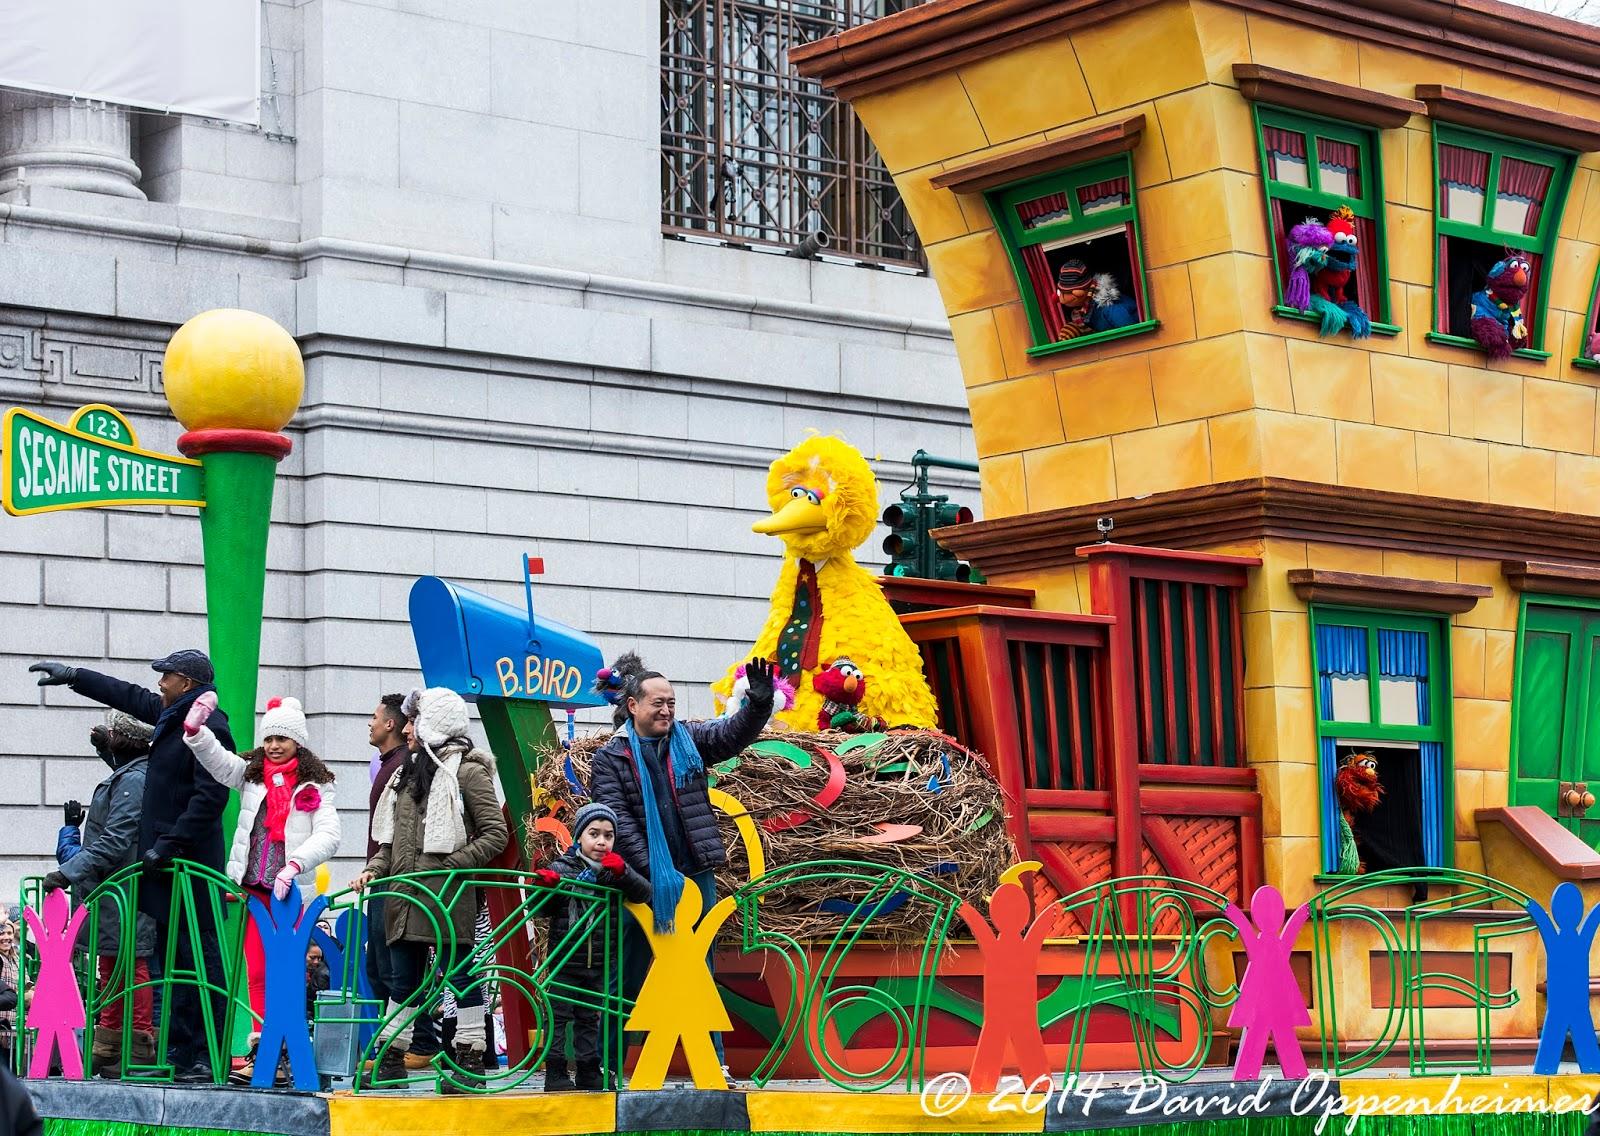 1-2-3 Sesame Street by Sesame Workshop